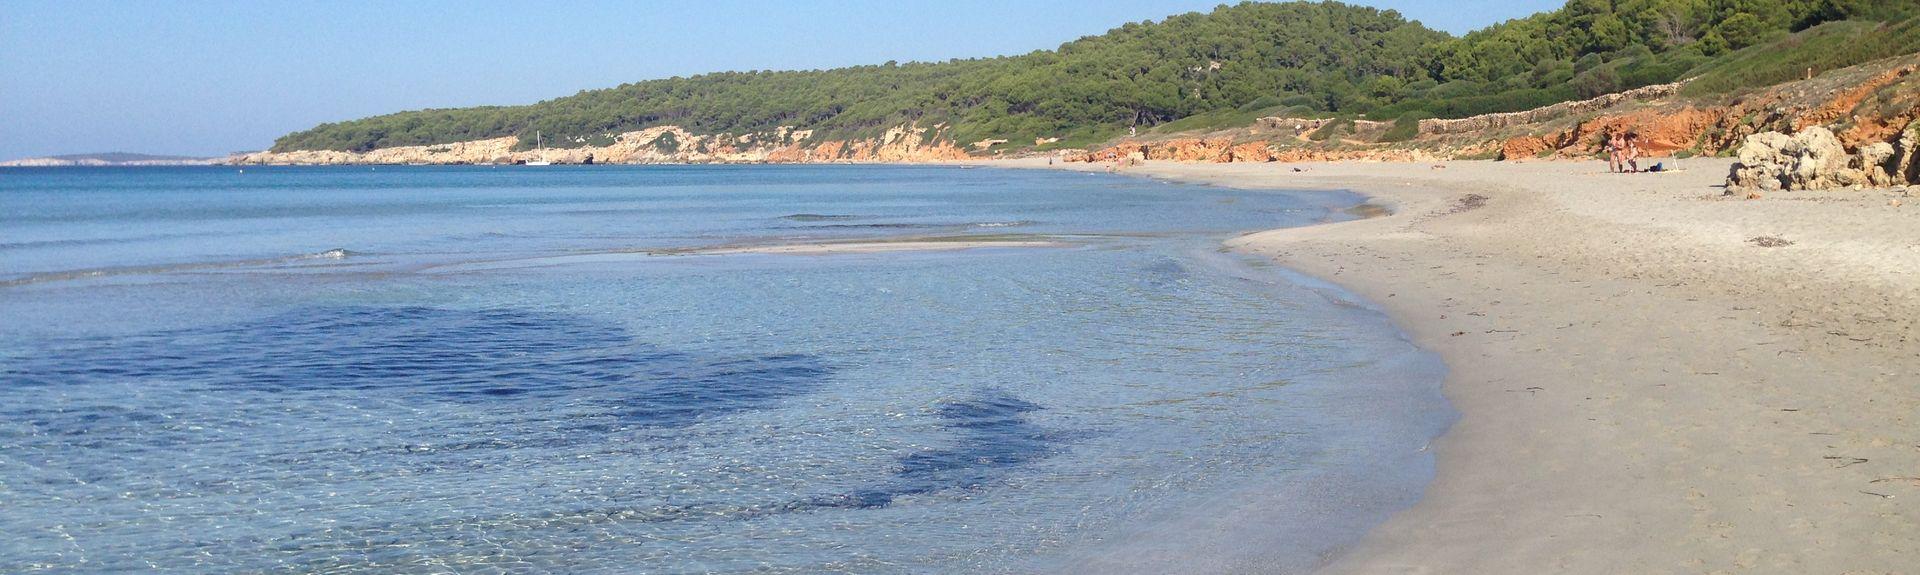 Strand von Macarelleta, Ciutadella de Menorca, Balearische Inseln, Spanien